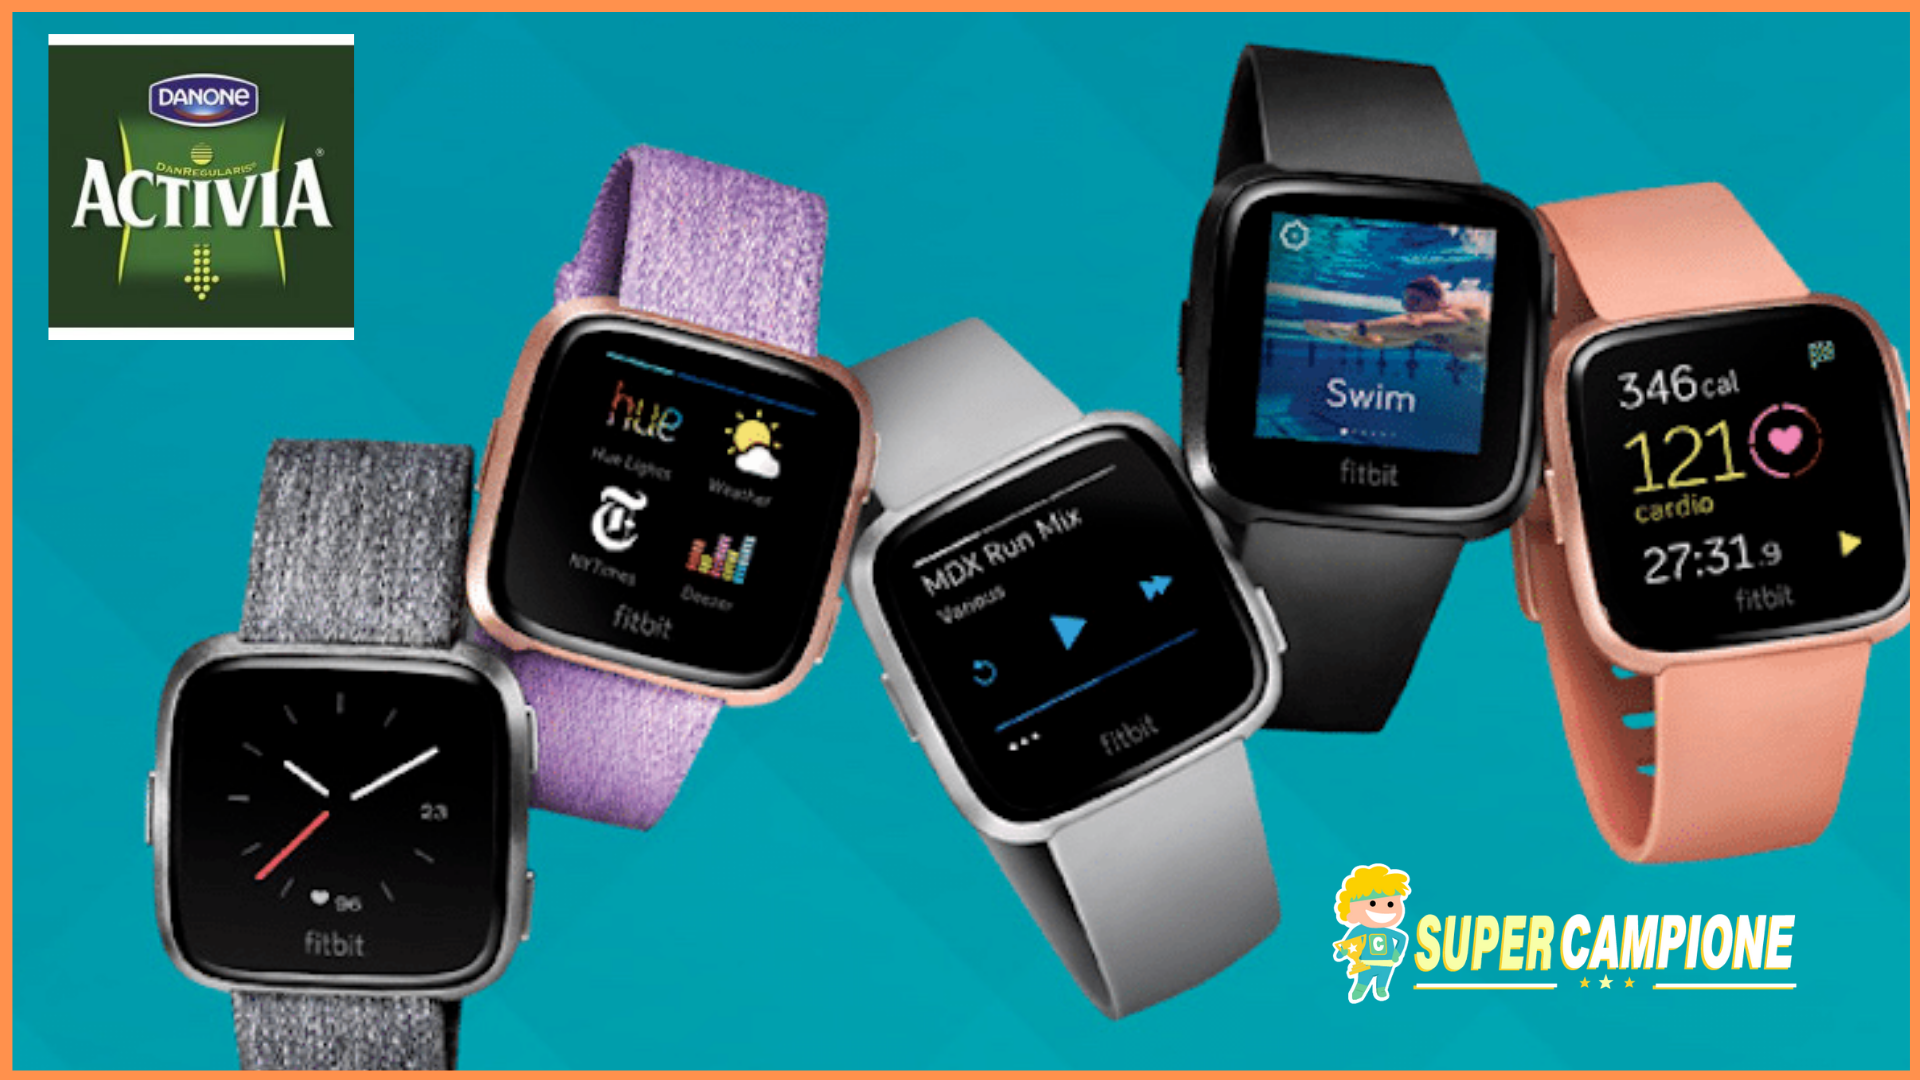 Vinci gratis 2 Smartwatch Fitbit Versa al giorno